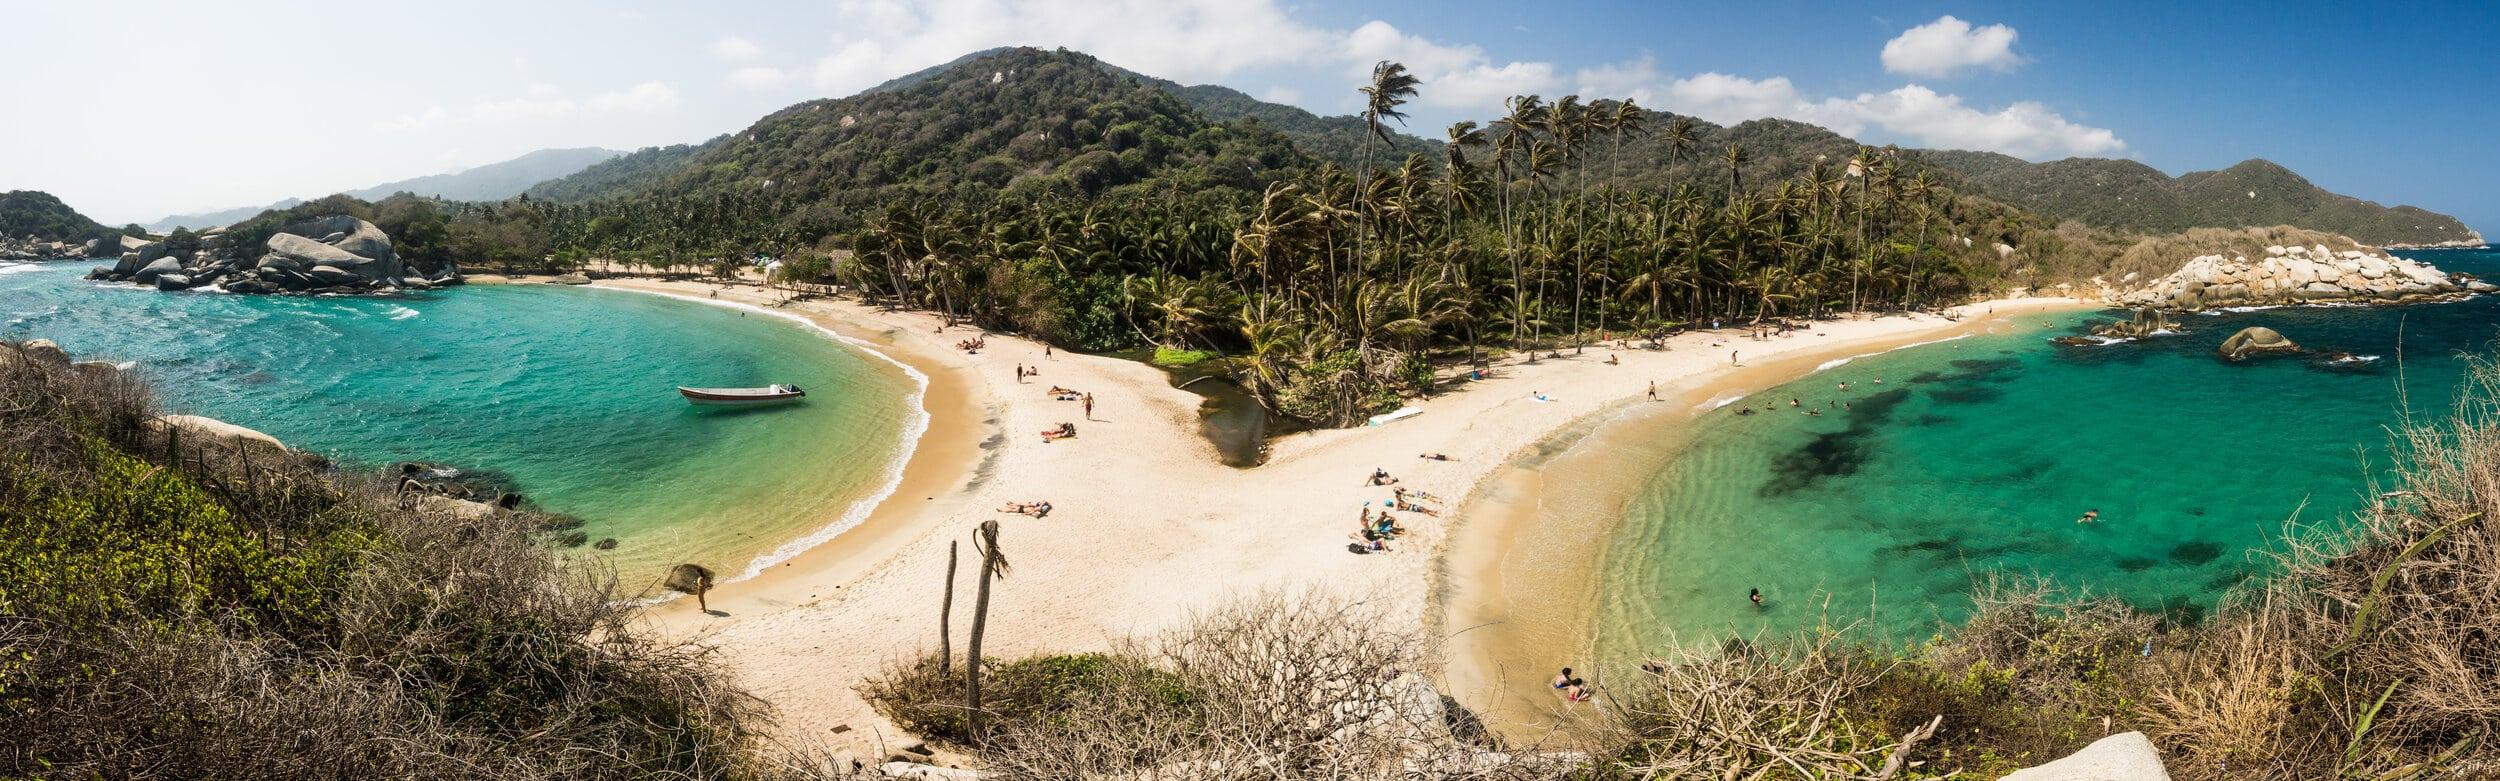 Columbian Beach